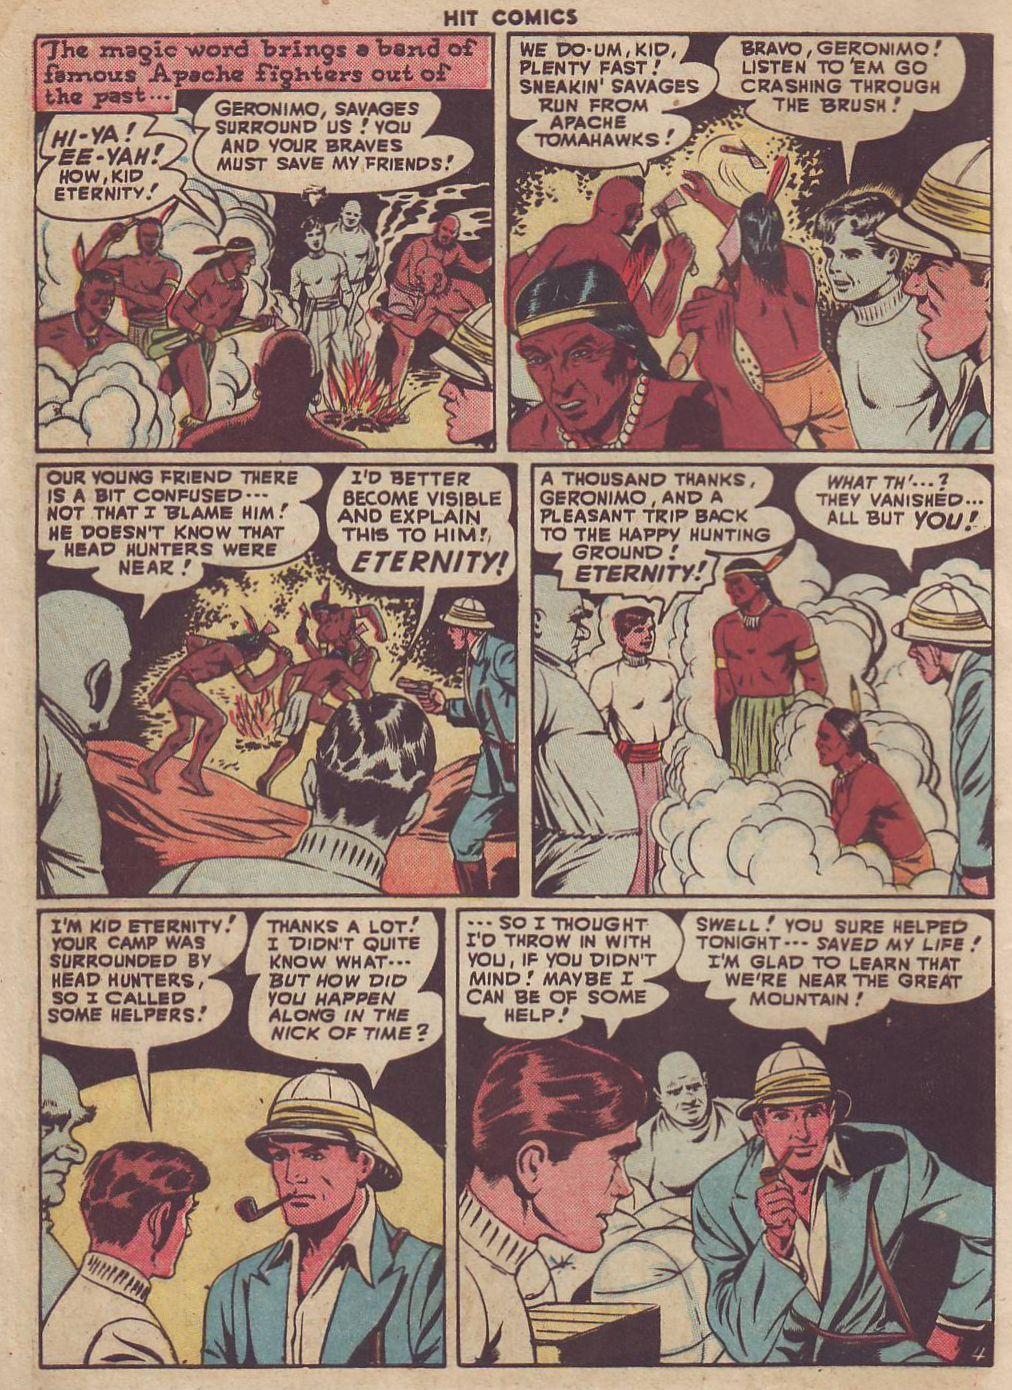 Read online Hit Comics comic -  Issue #51 - 6